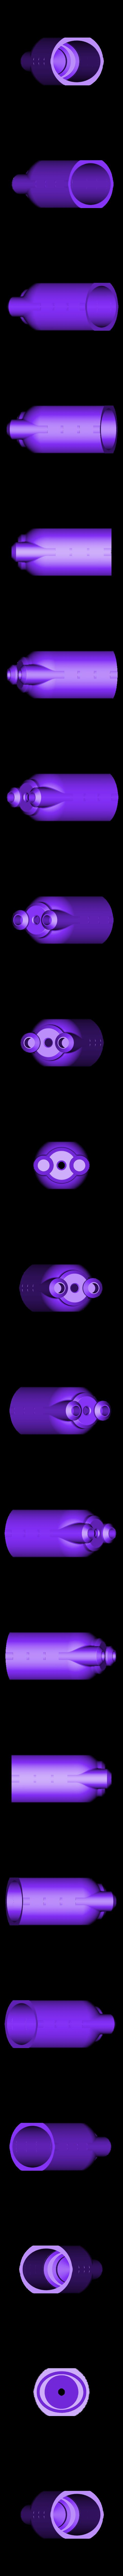 pi_zero_lower_without_holes.stl Download free STL file PI ZERO - FALLOUT FUSION CORE + ZERO 4U CASE • 3D print template, MuSSy